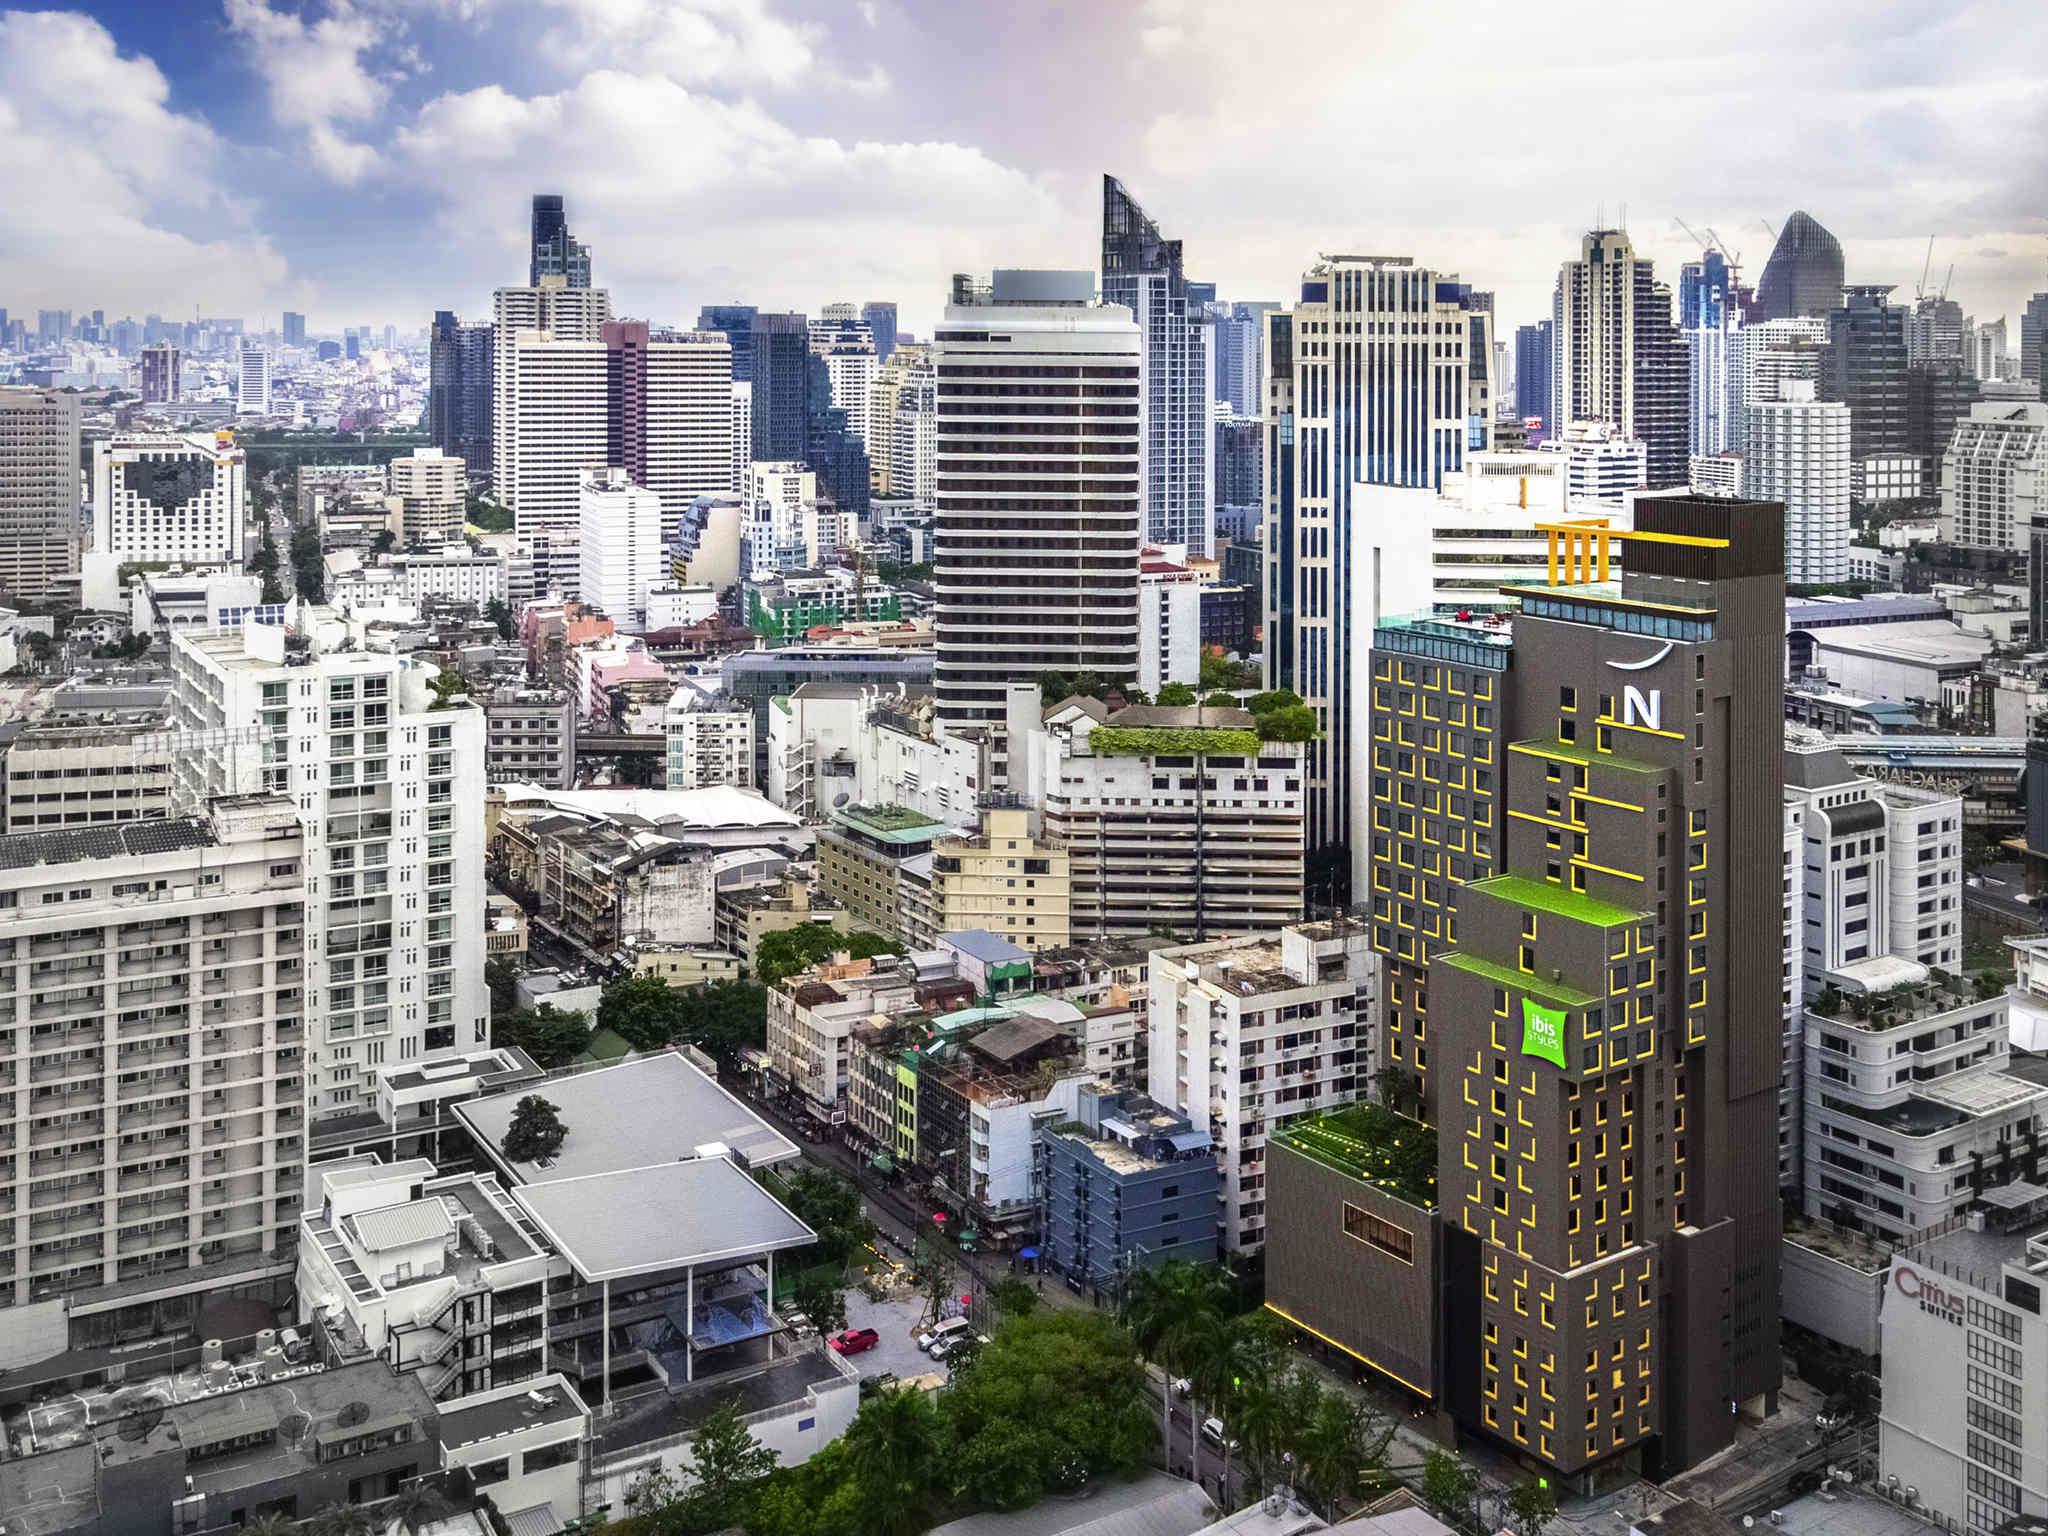 Hotel – ibis Styles Bangkok Sukhumvit 4 (otwarcie w październiku 2018)